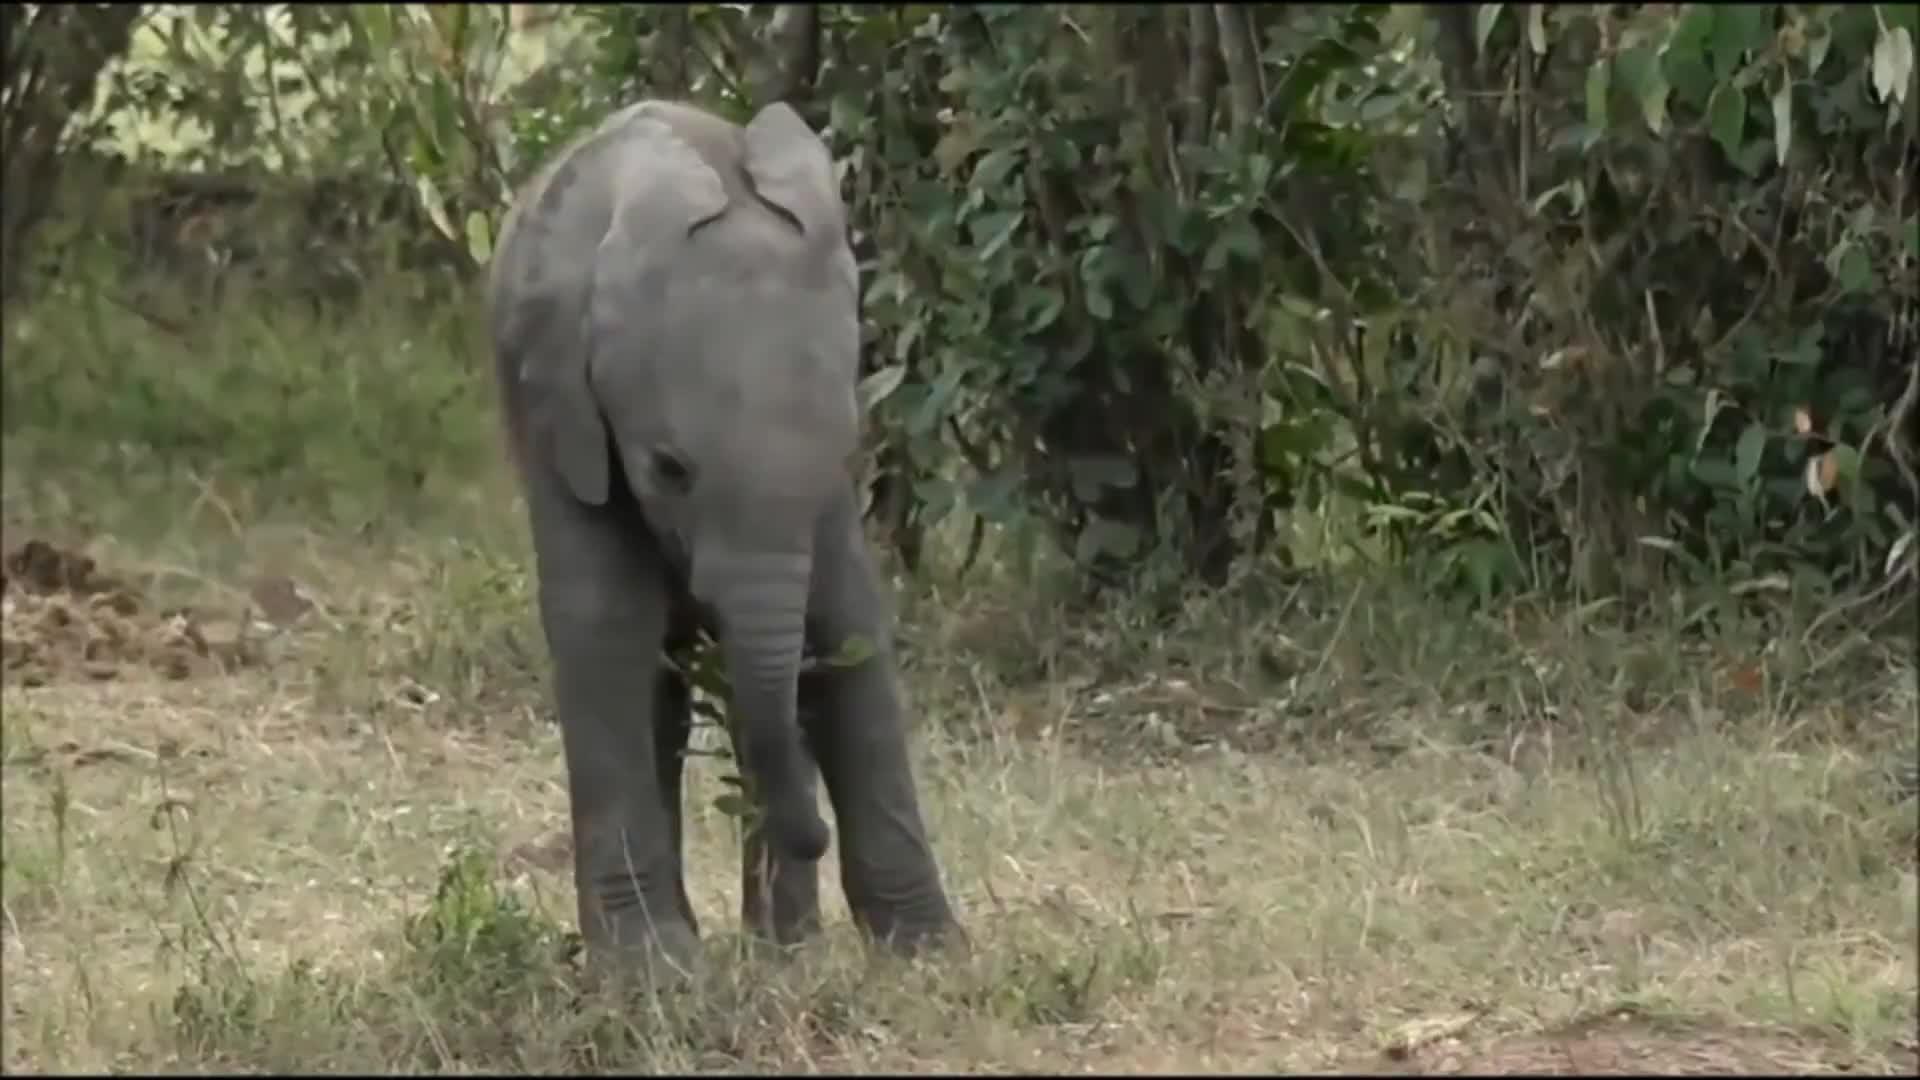 Cute baby elephant and a little bush. GIFs